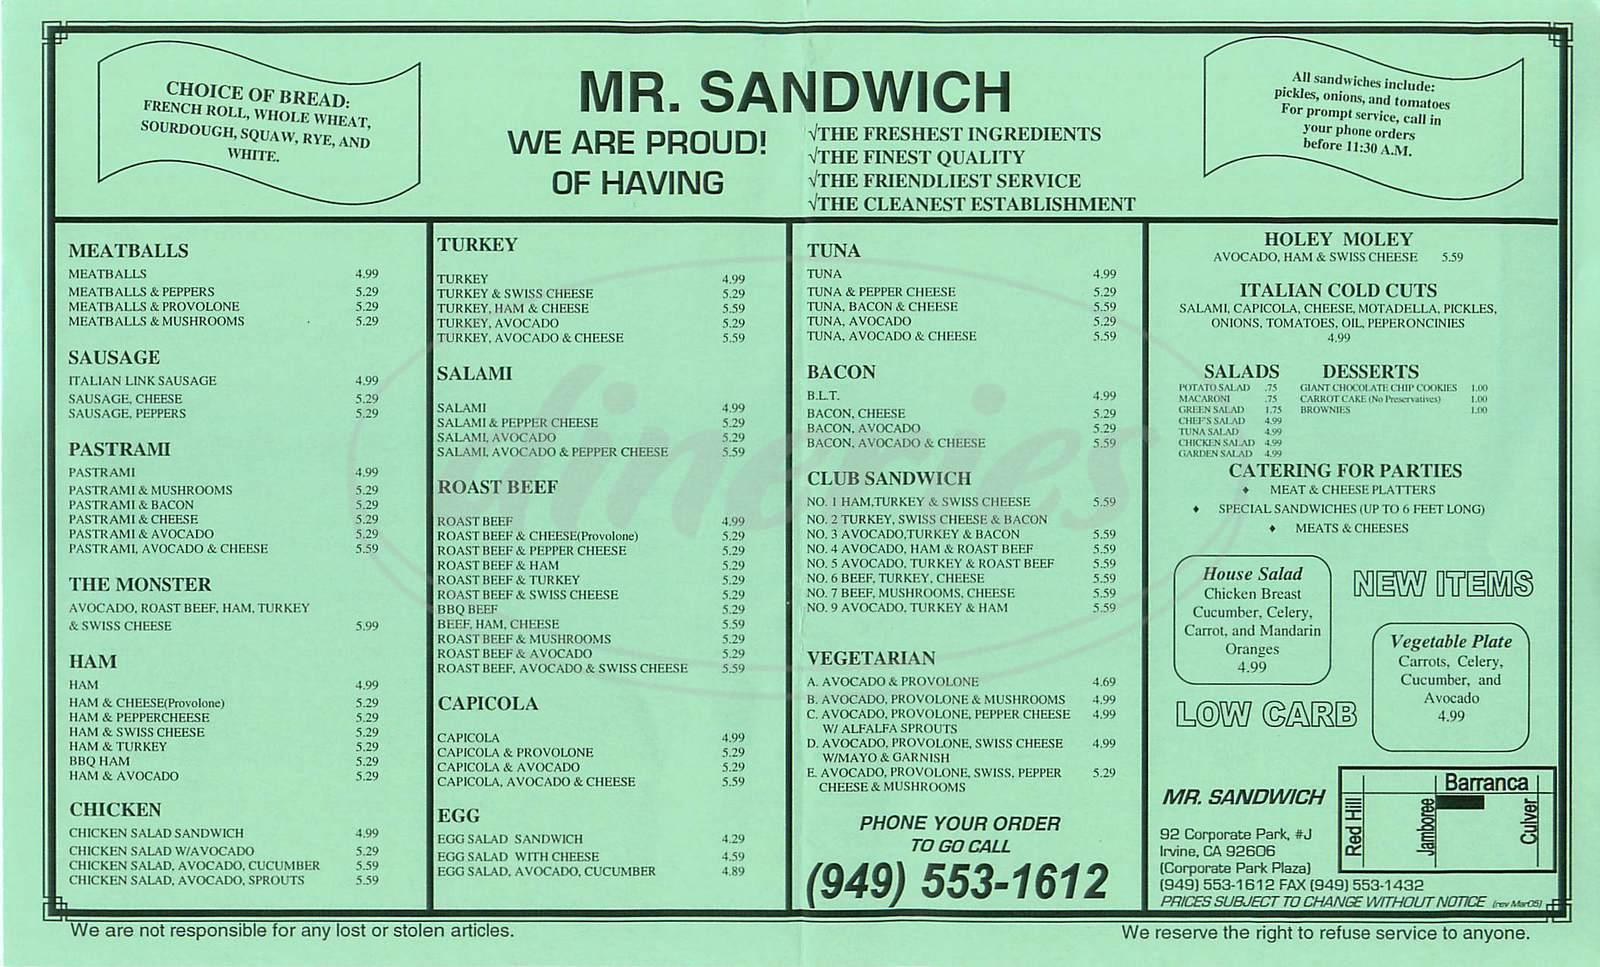 menu for Mr. Sandwich